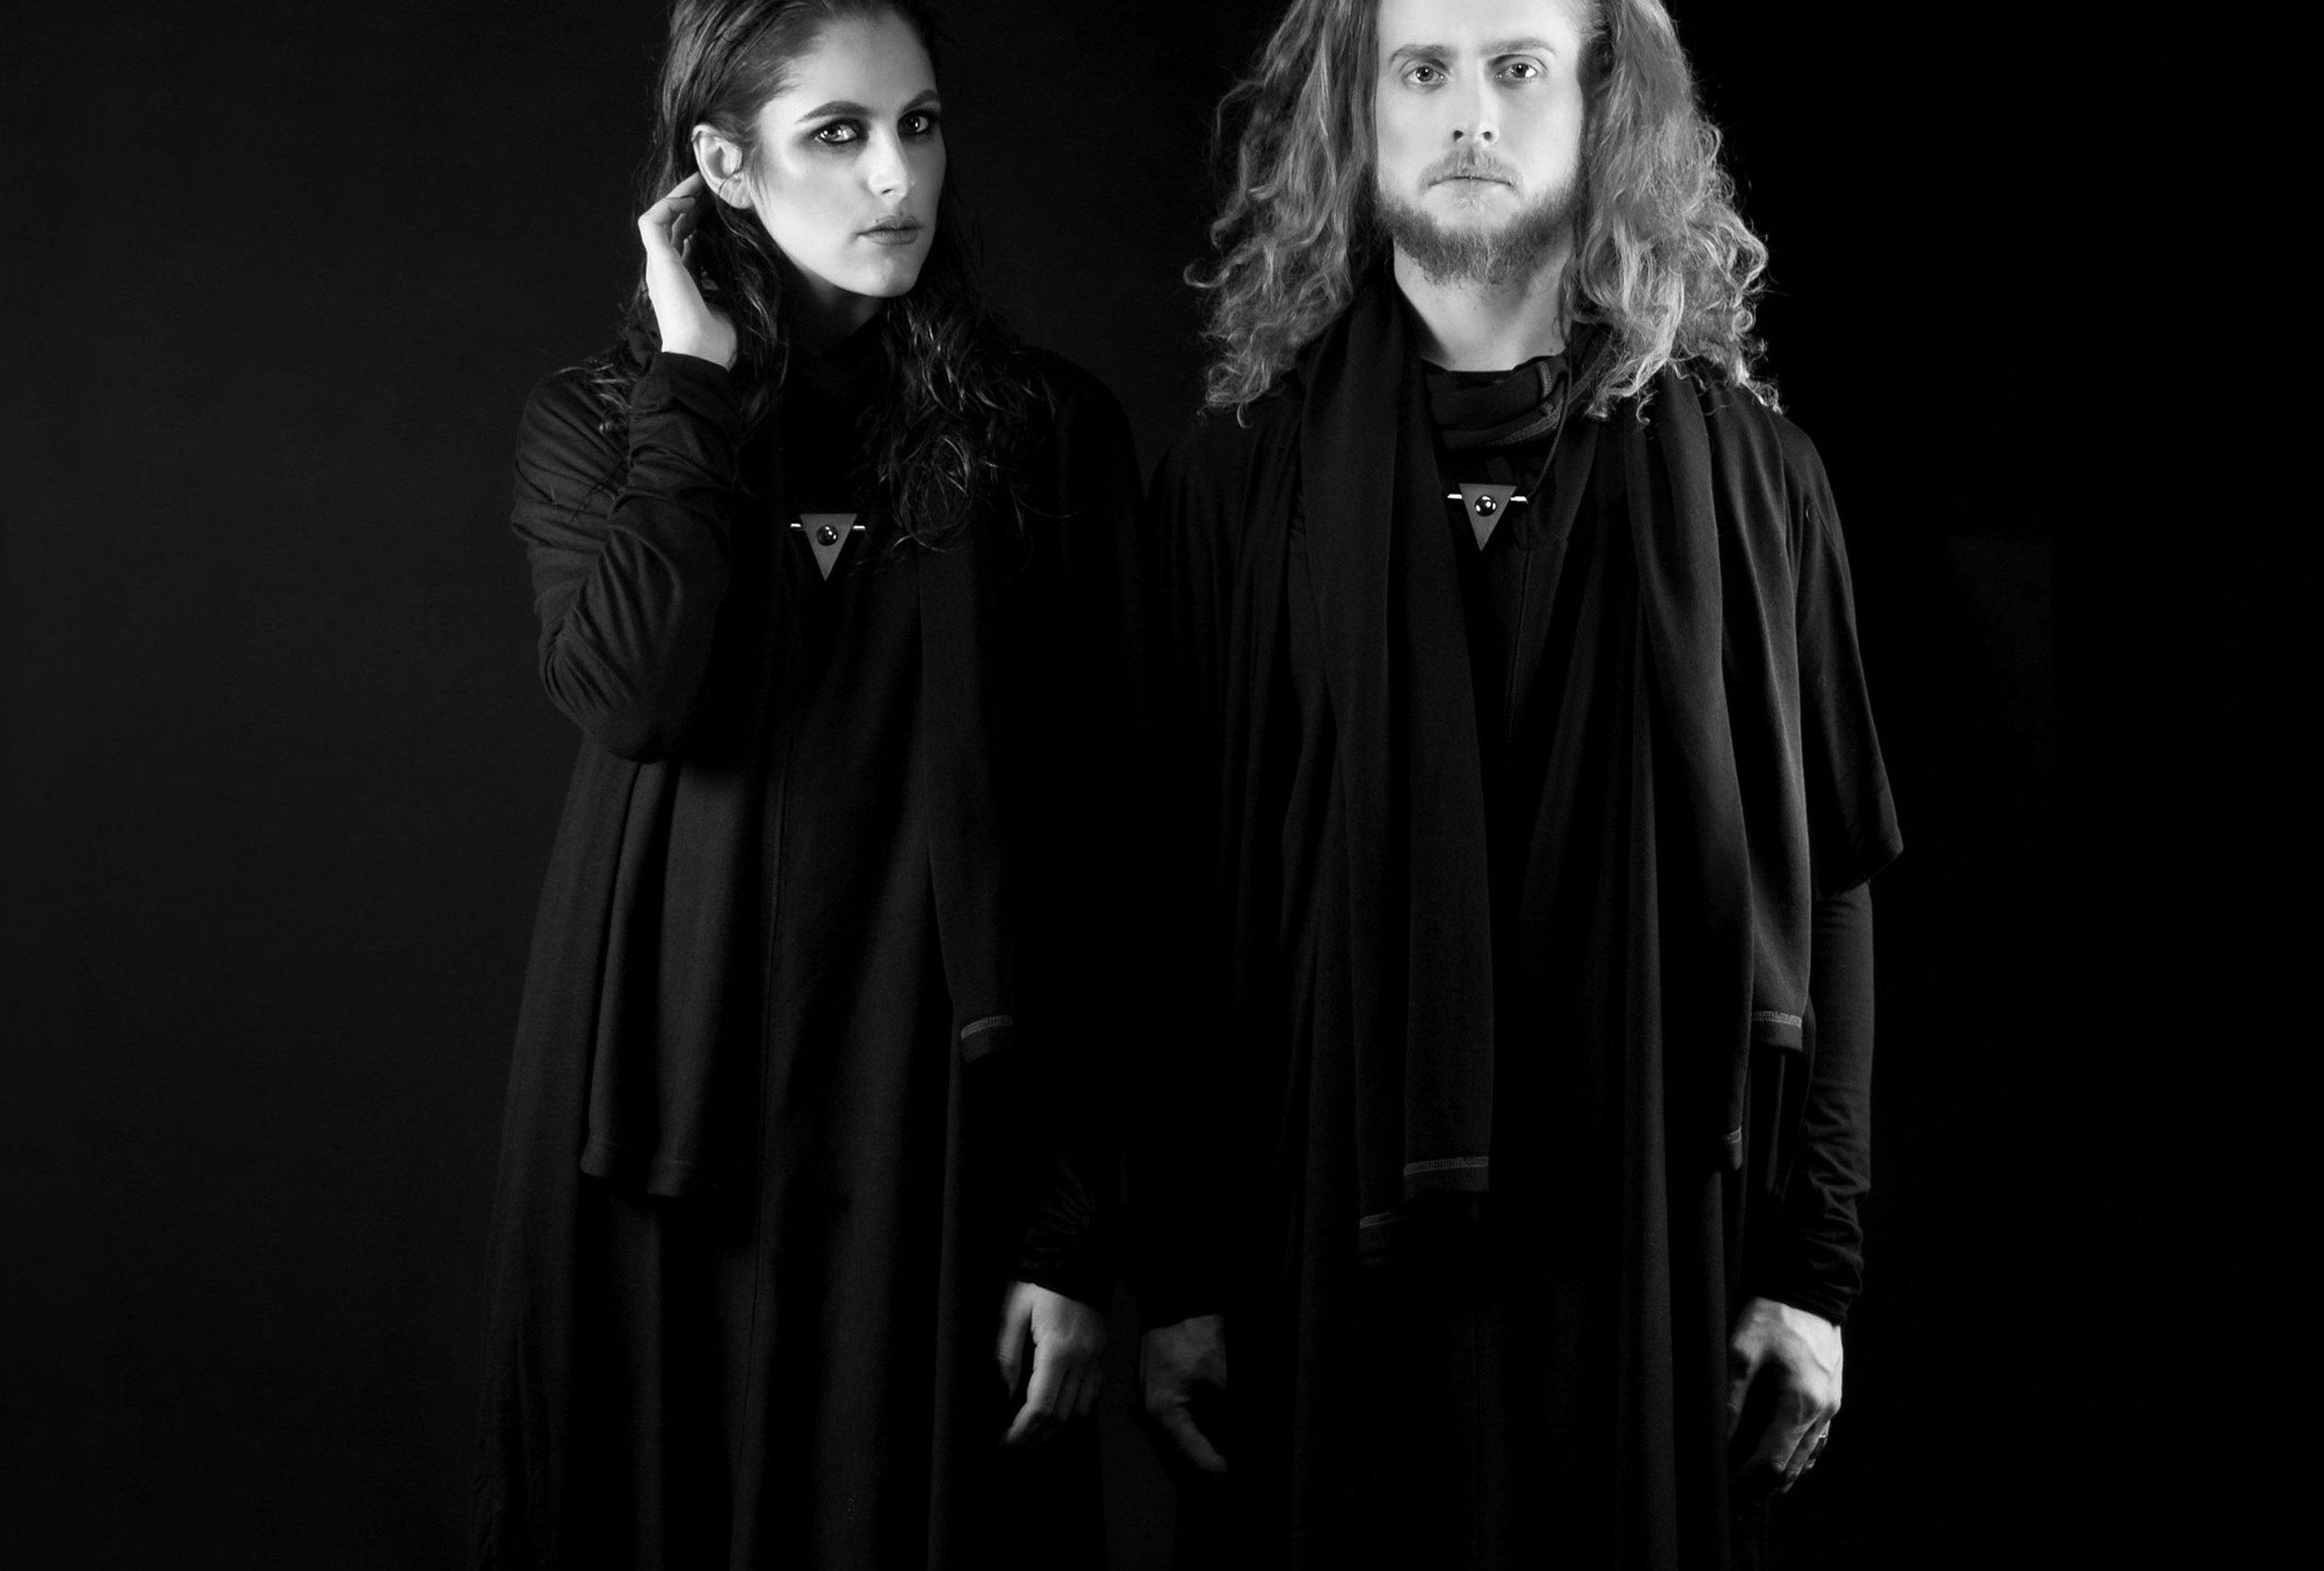 Yang-Velvit-Black-Clothing-All-Black-33.jpg